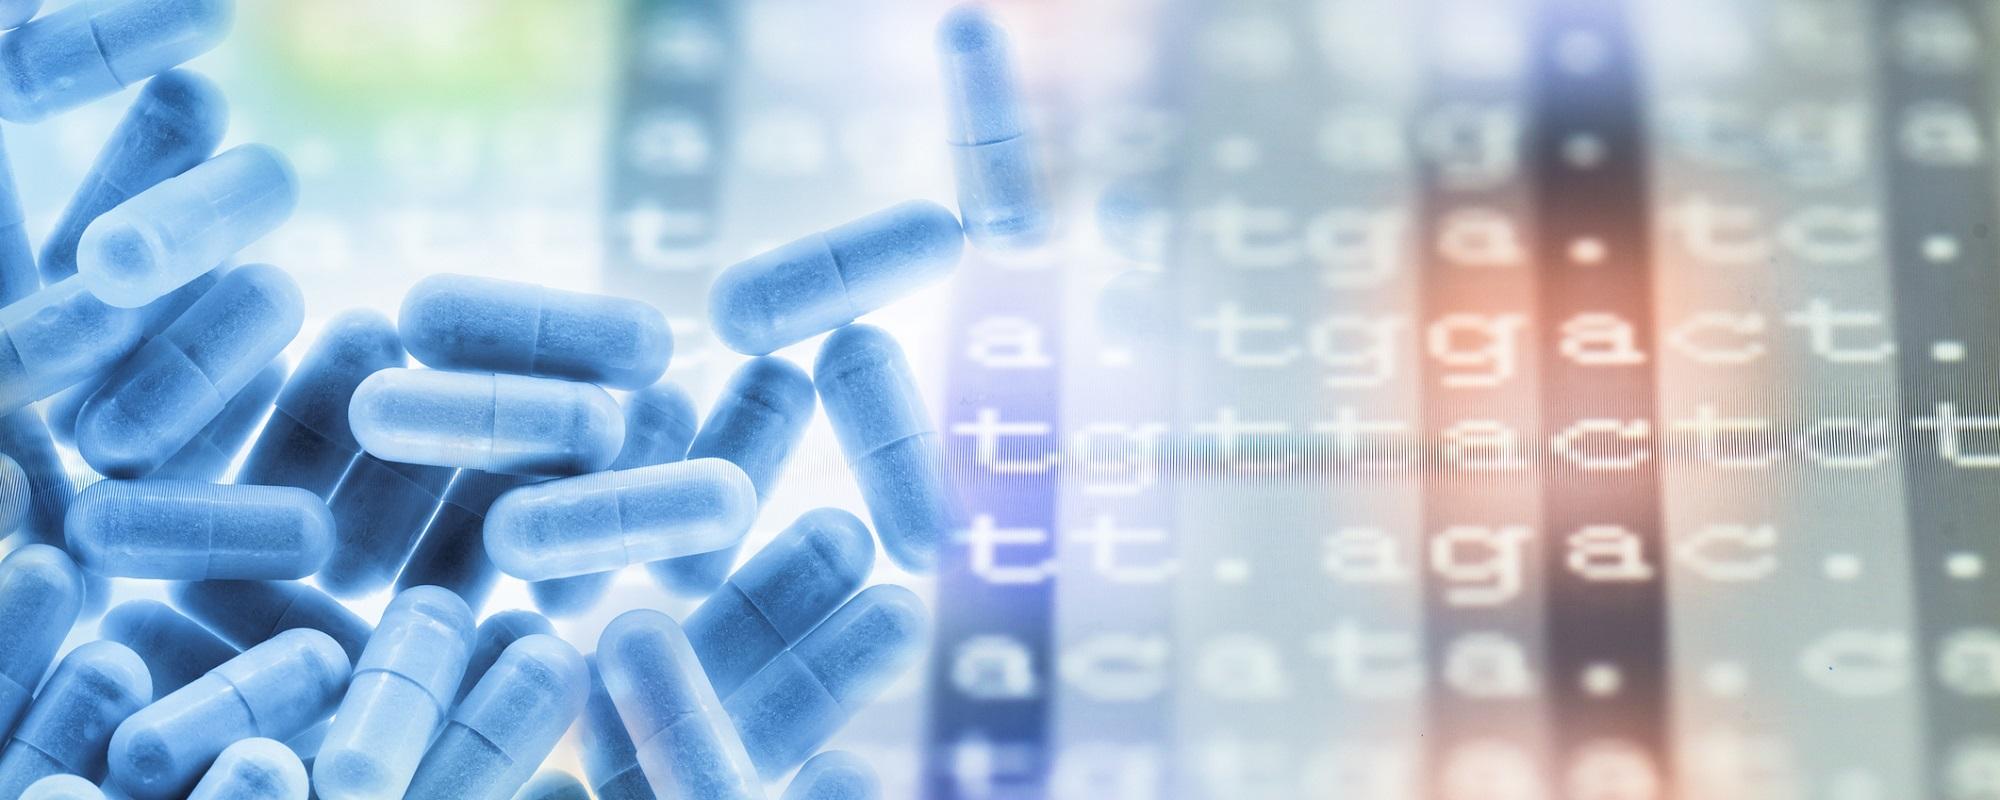 Precision Syringe Pump Applications in Biopharmaceutical Drug Development